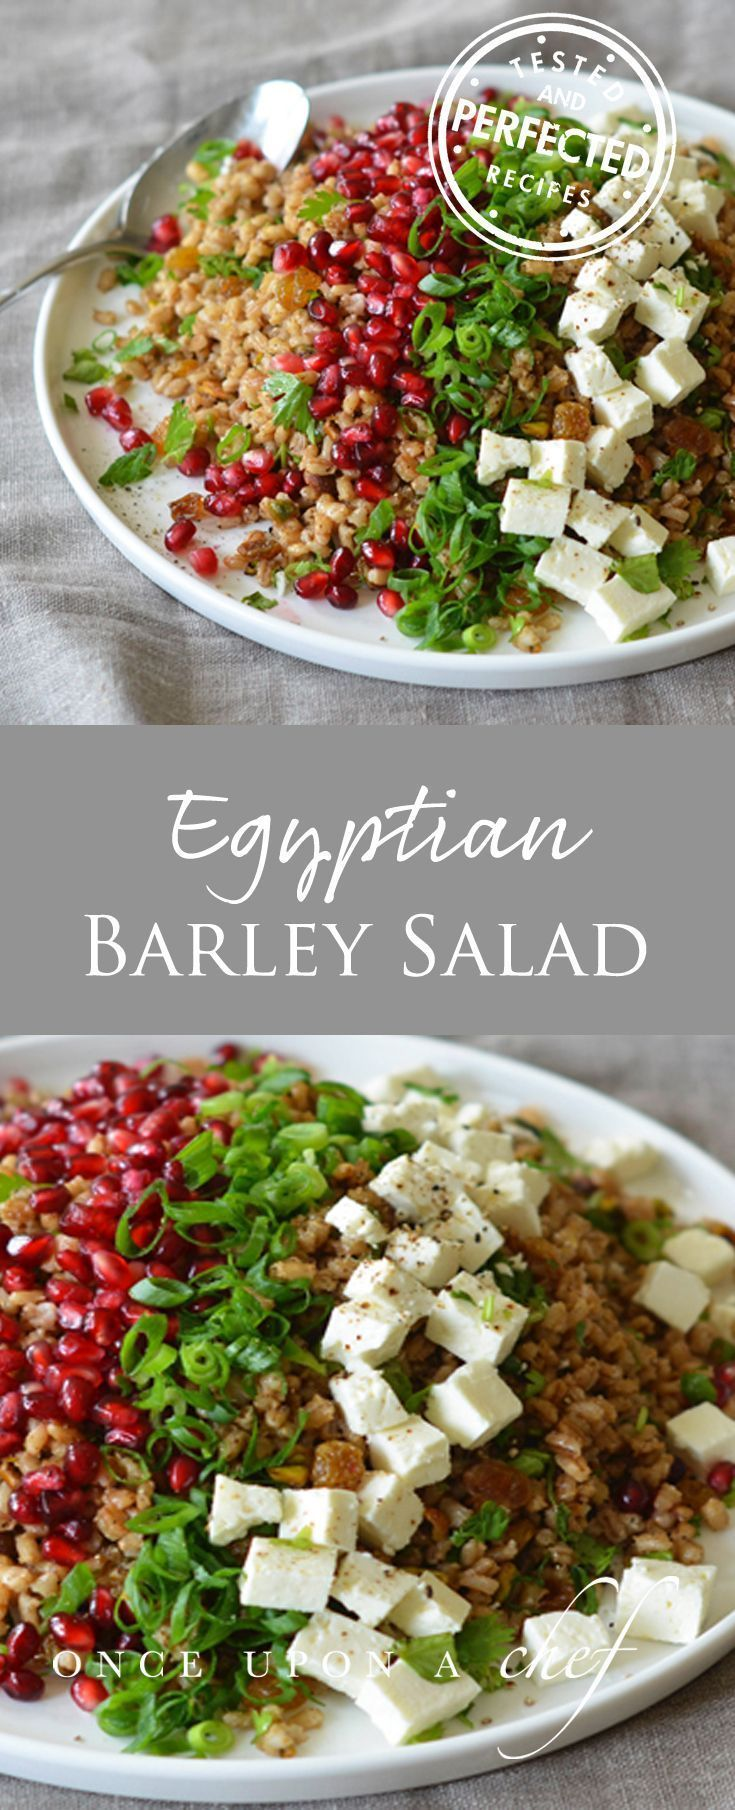 Egyptian Barley Salad with Pomegranate Vinaigrette | #saladrecipes #barley